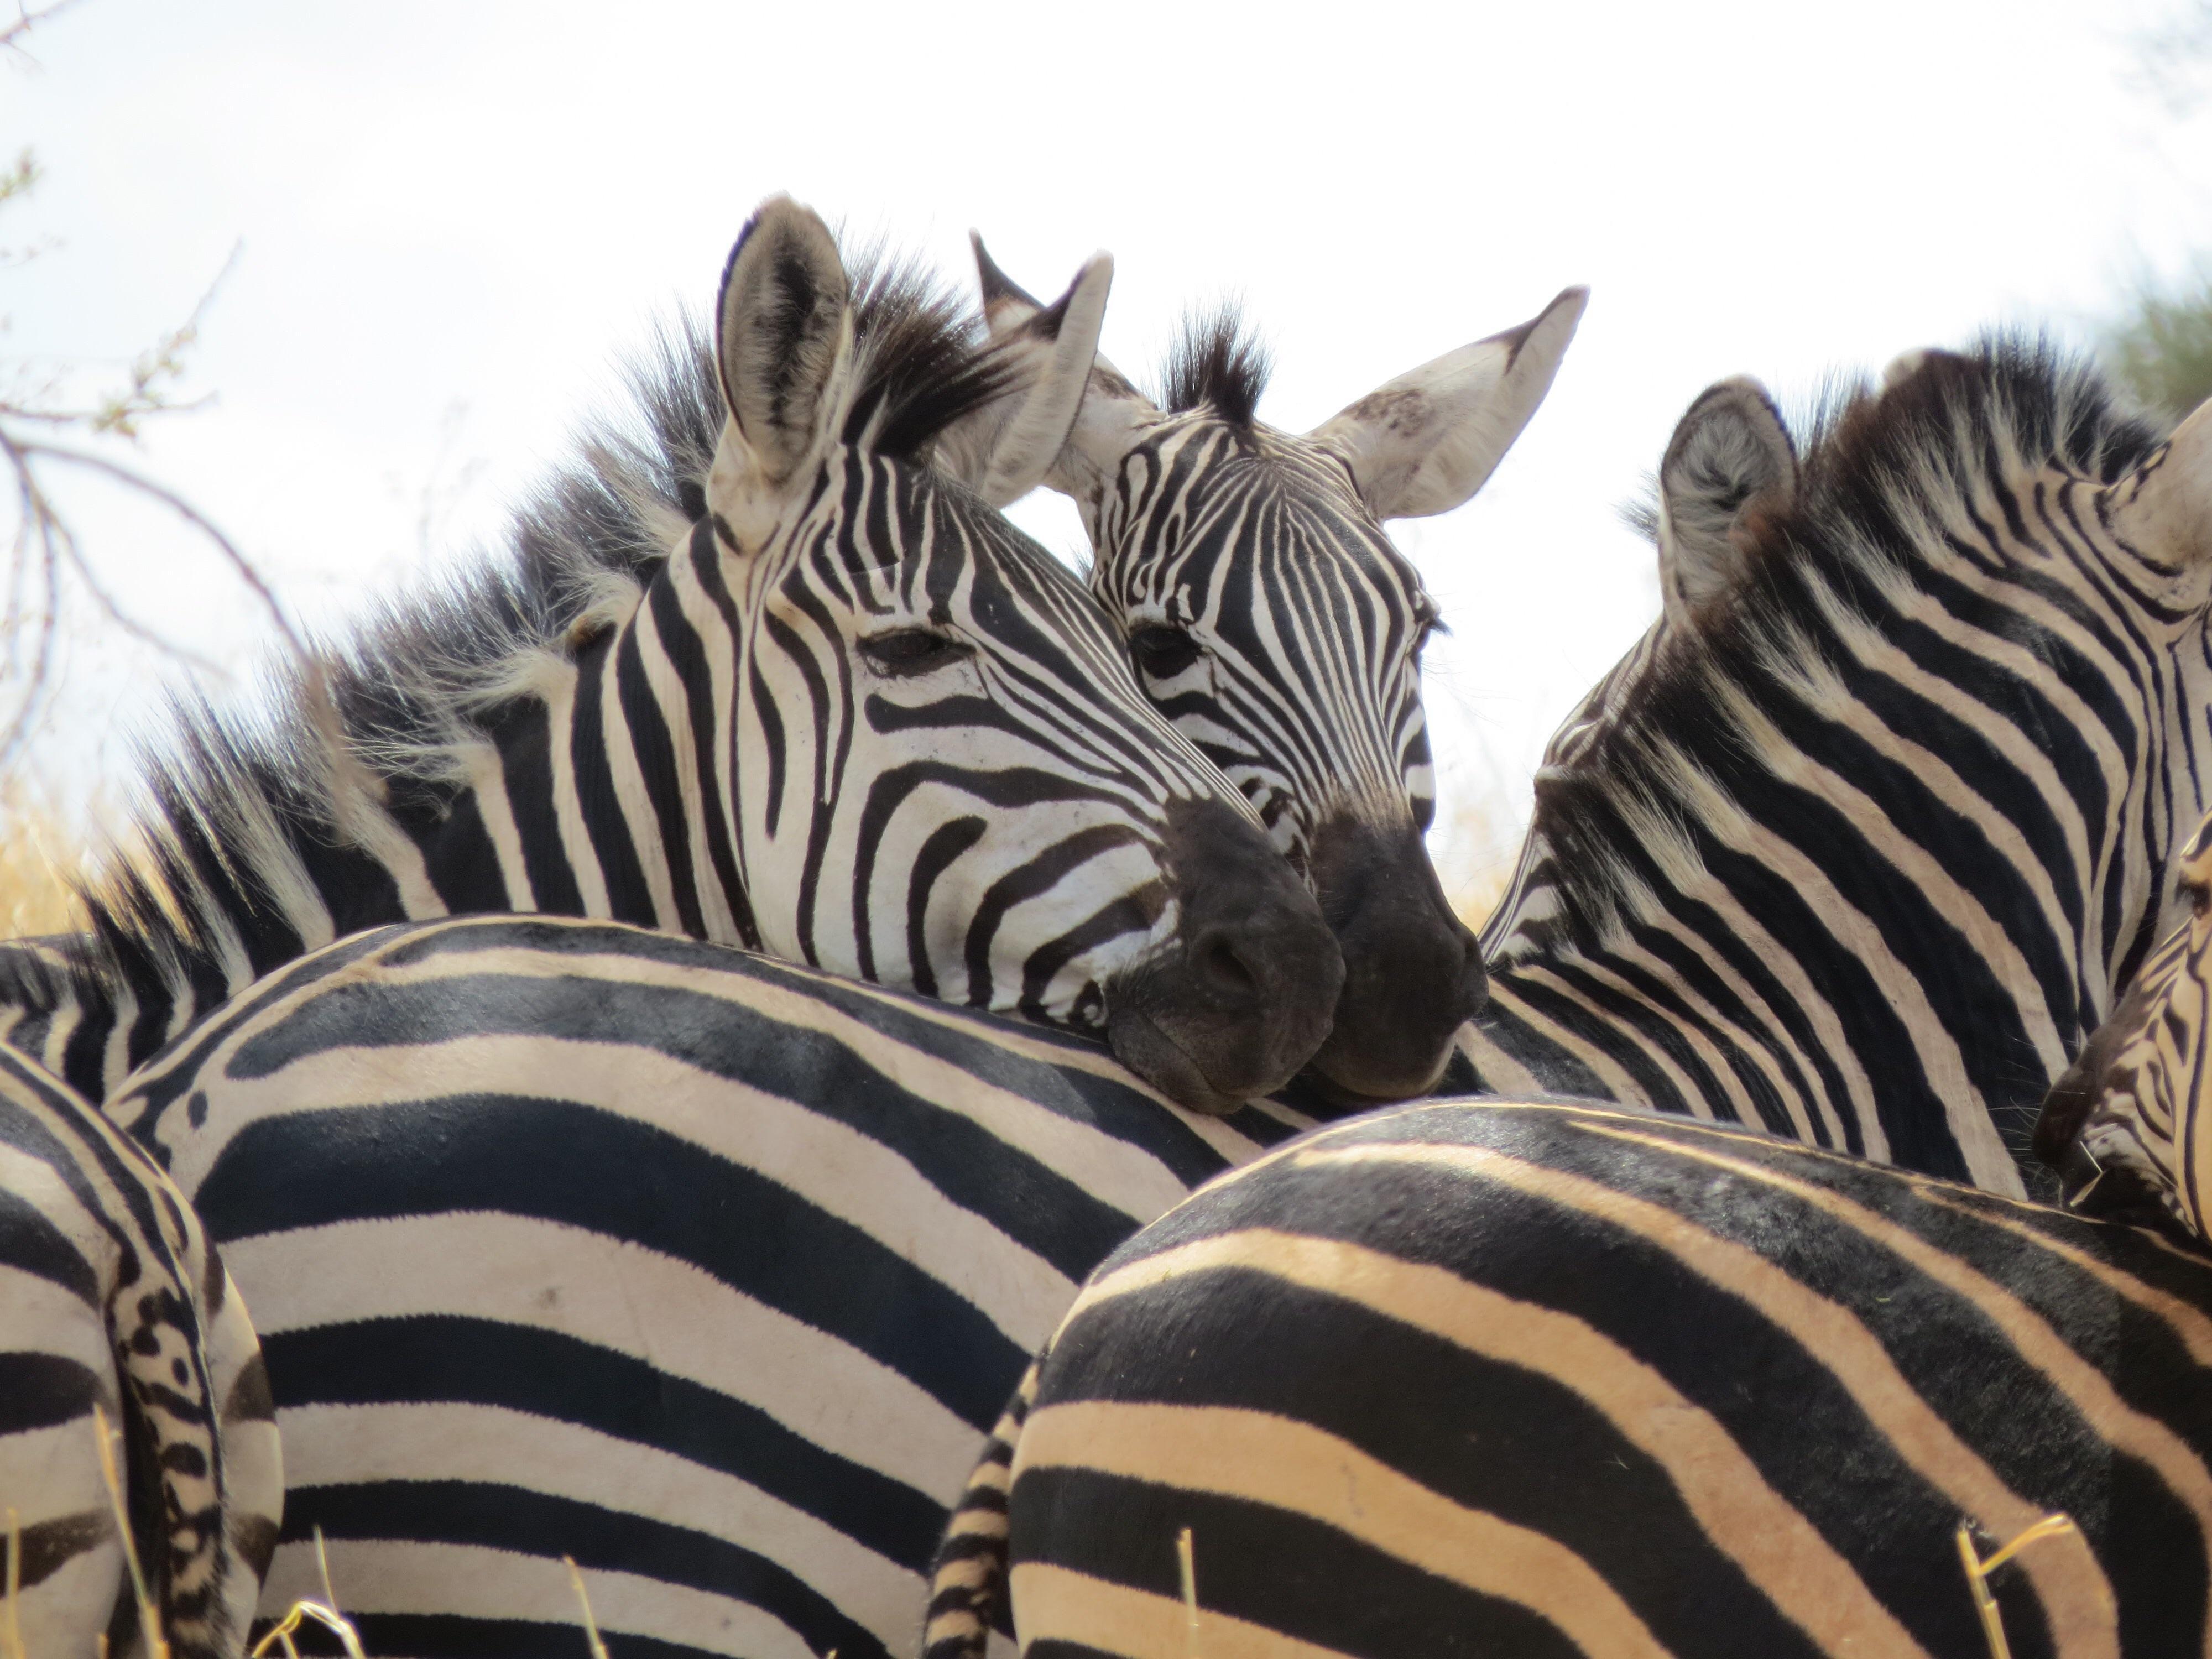 Zebras, Tarangire National Park, Tanzania